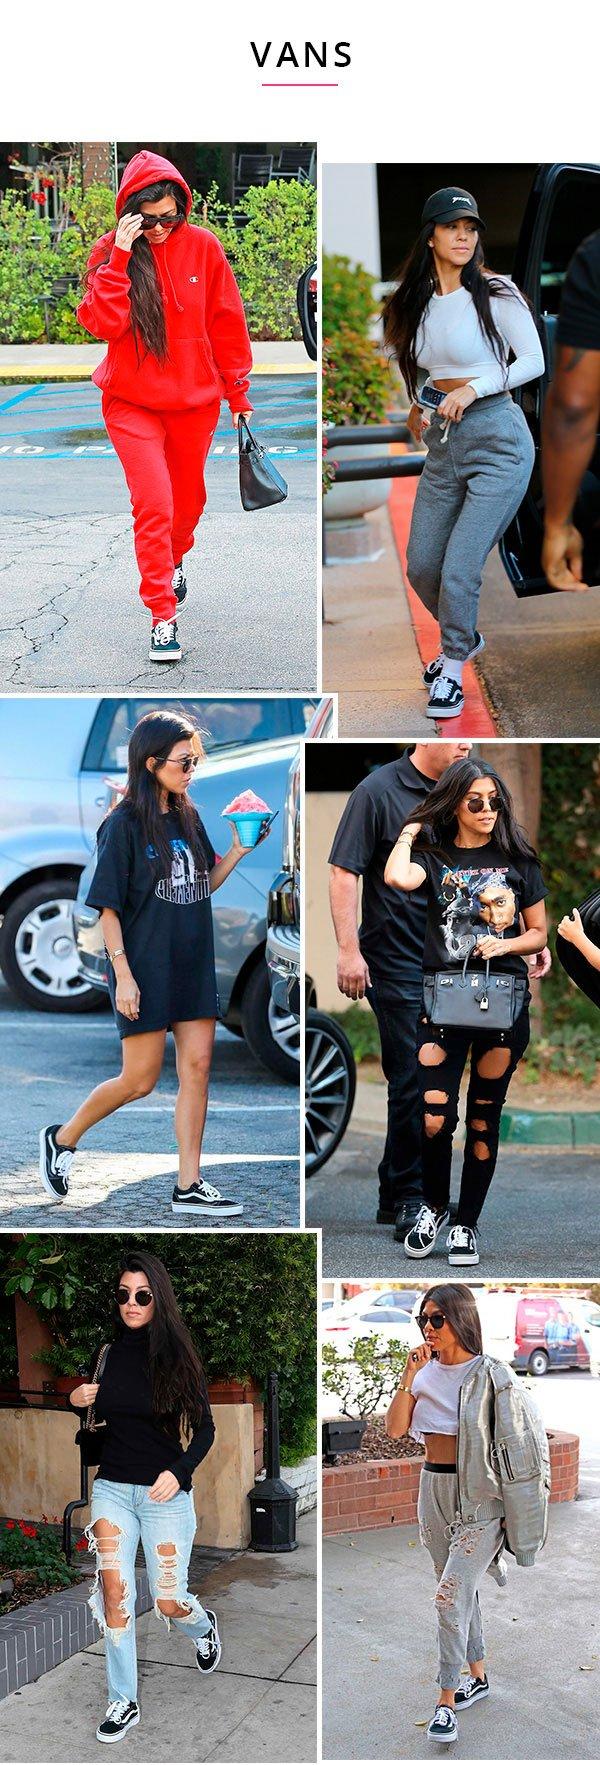 kourtney kardashian usando tenis vans